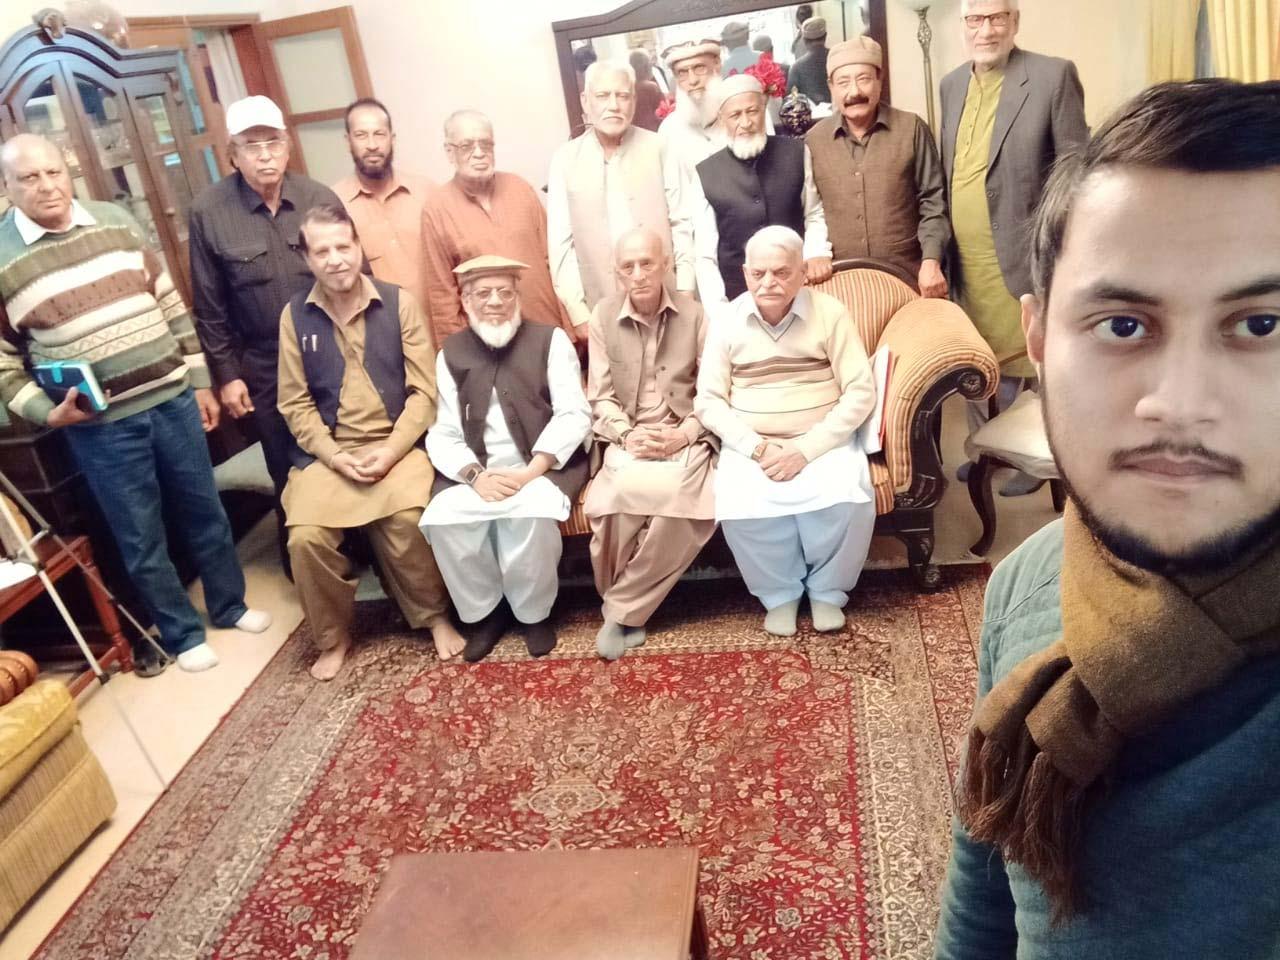 Sitting: Fazal Ur Rehman Khan, Engr. Iqbal Ahmed Khan, Kosar Naqvi, Waseem Siddiqui - Standing: Farooq Khan, Ata Ur Rehman, Manazir Hussain, MA Matin, Shabbar Abidi, M. Idrees Siddiqui, Sabir Ali Khan, Muhammad Salim Hamid, On the back Saleemullah Hussain. The grandson of Kosar Naqvi is taking the selfie